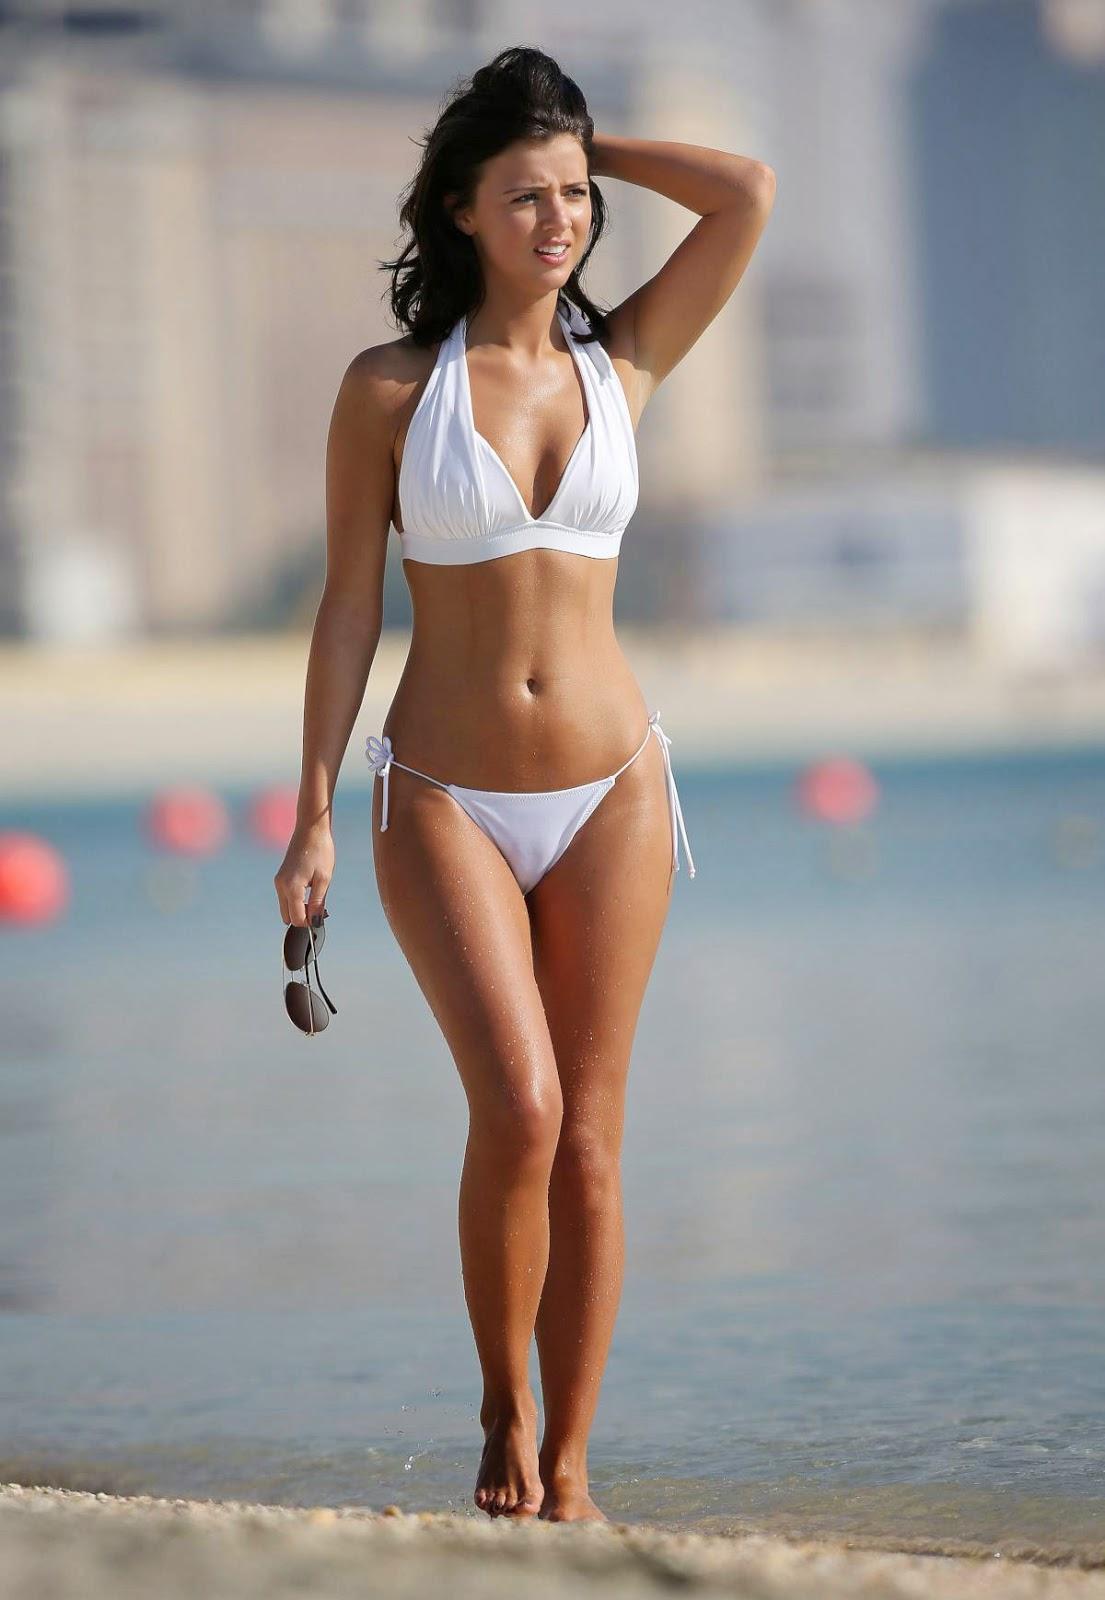 Lucy Mecklenburgh White Bikini Cameltoe Candid Photos In  : LucyMecklenburghWhiteBikiniCameltoeCandidPhotosInDubaiwwwGutterUncensoredcom001 from gutteruncensored.info size 1105 x 1600 jpeg 150kB